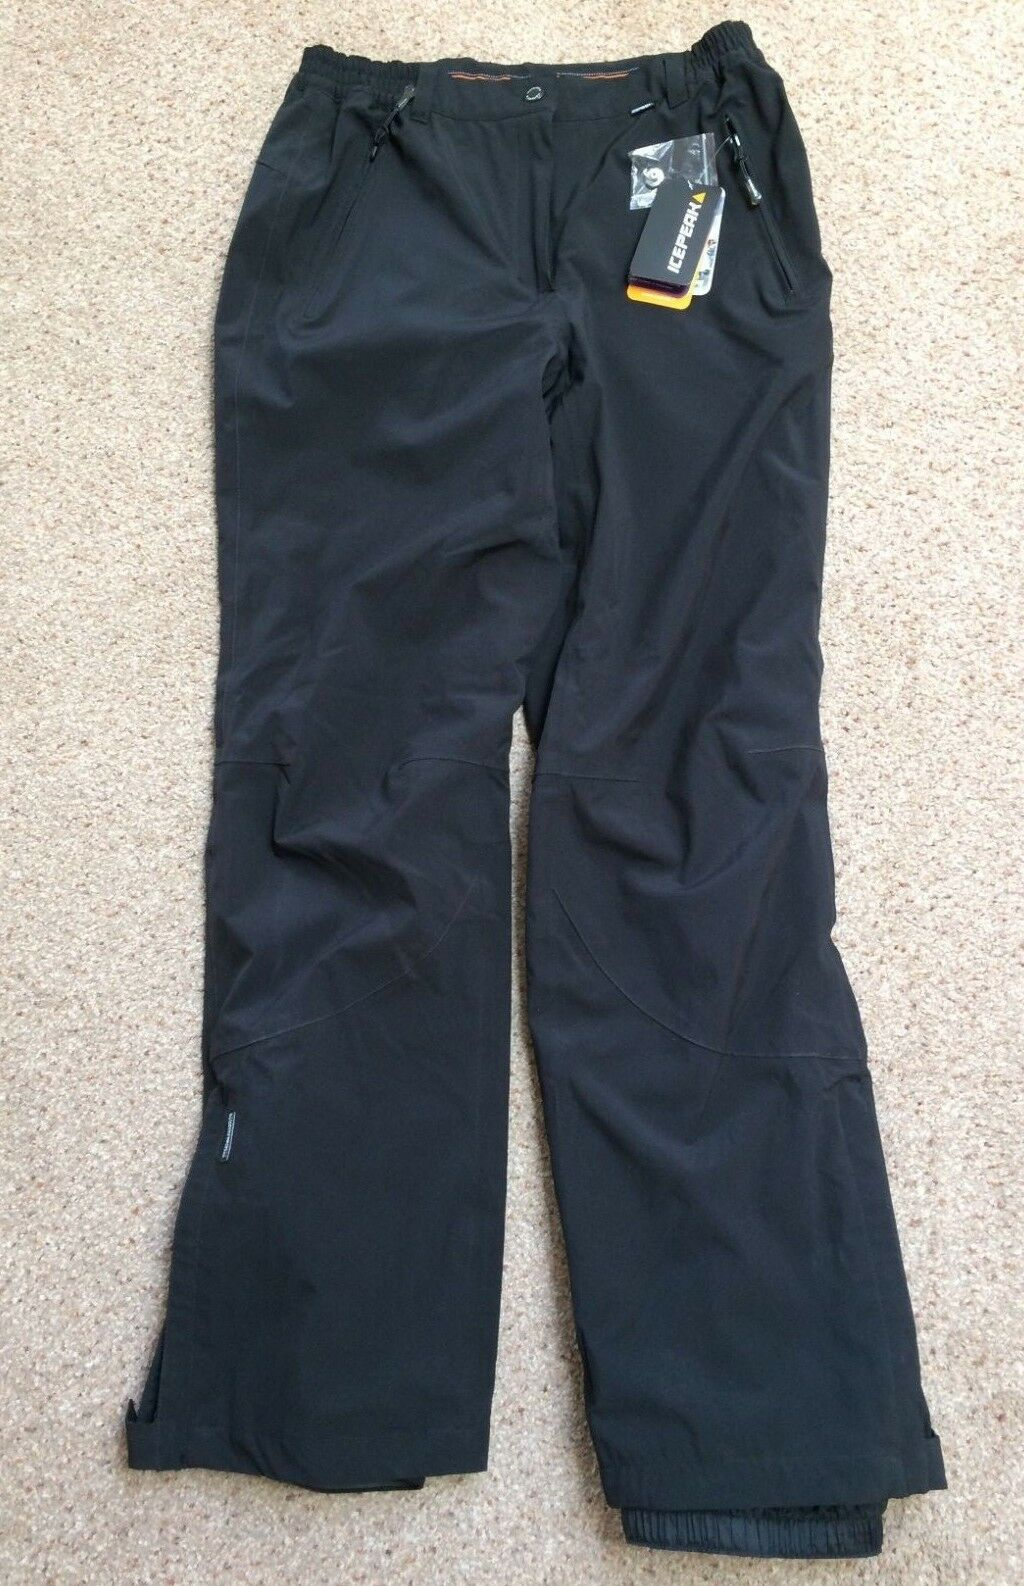 Icepeak Lita womens skiing snowboarding trousers, brand new